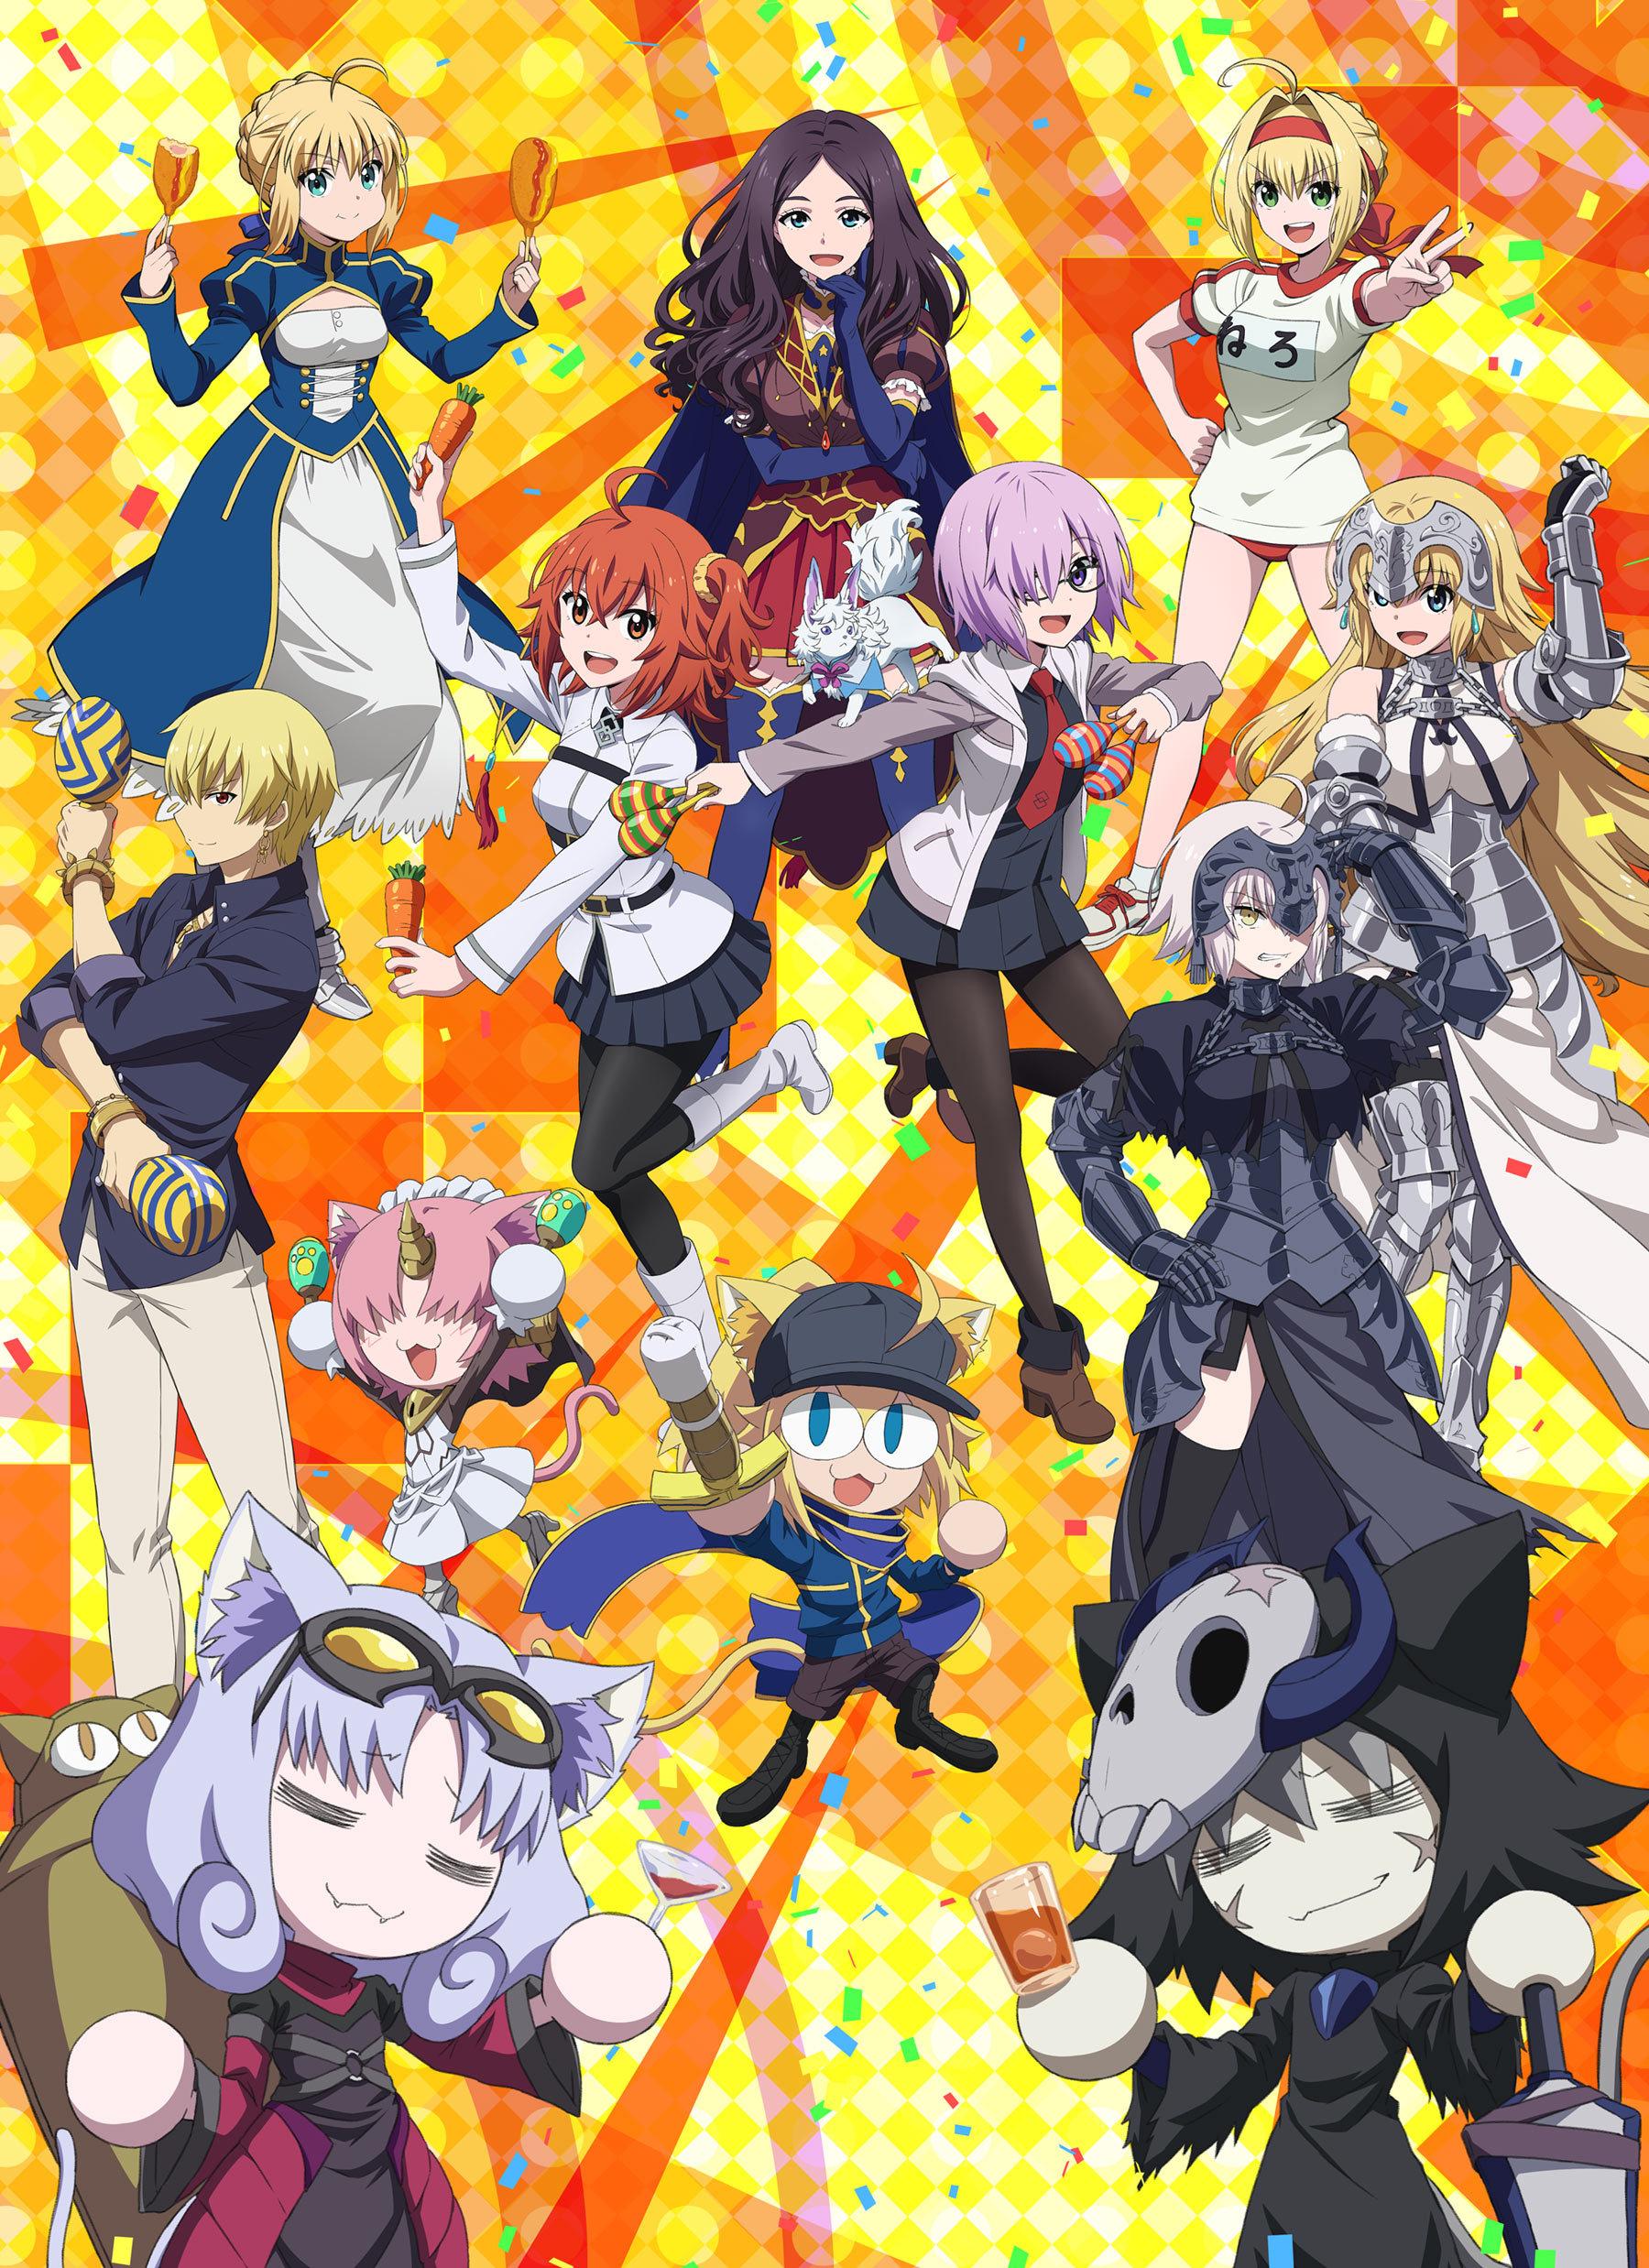 OVA动画「Fate/Grand Carnival」新主视觉图公开,「第二特异宴 夜之特异点 歌舞伎町」先行图公开